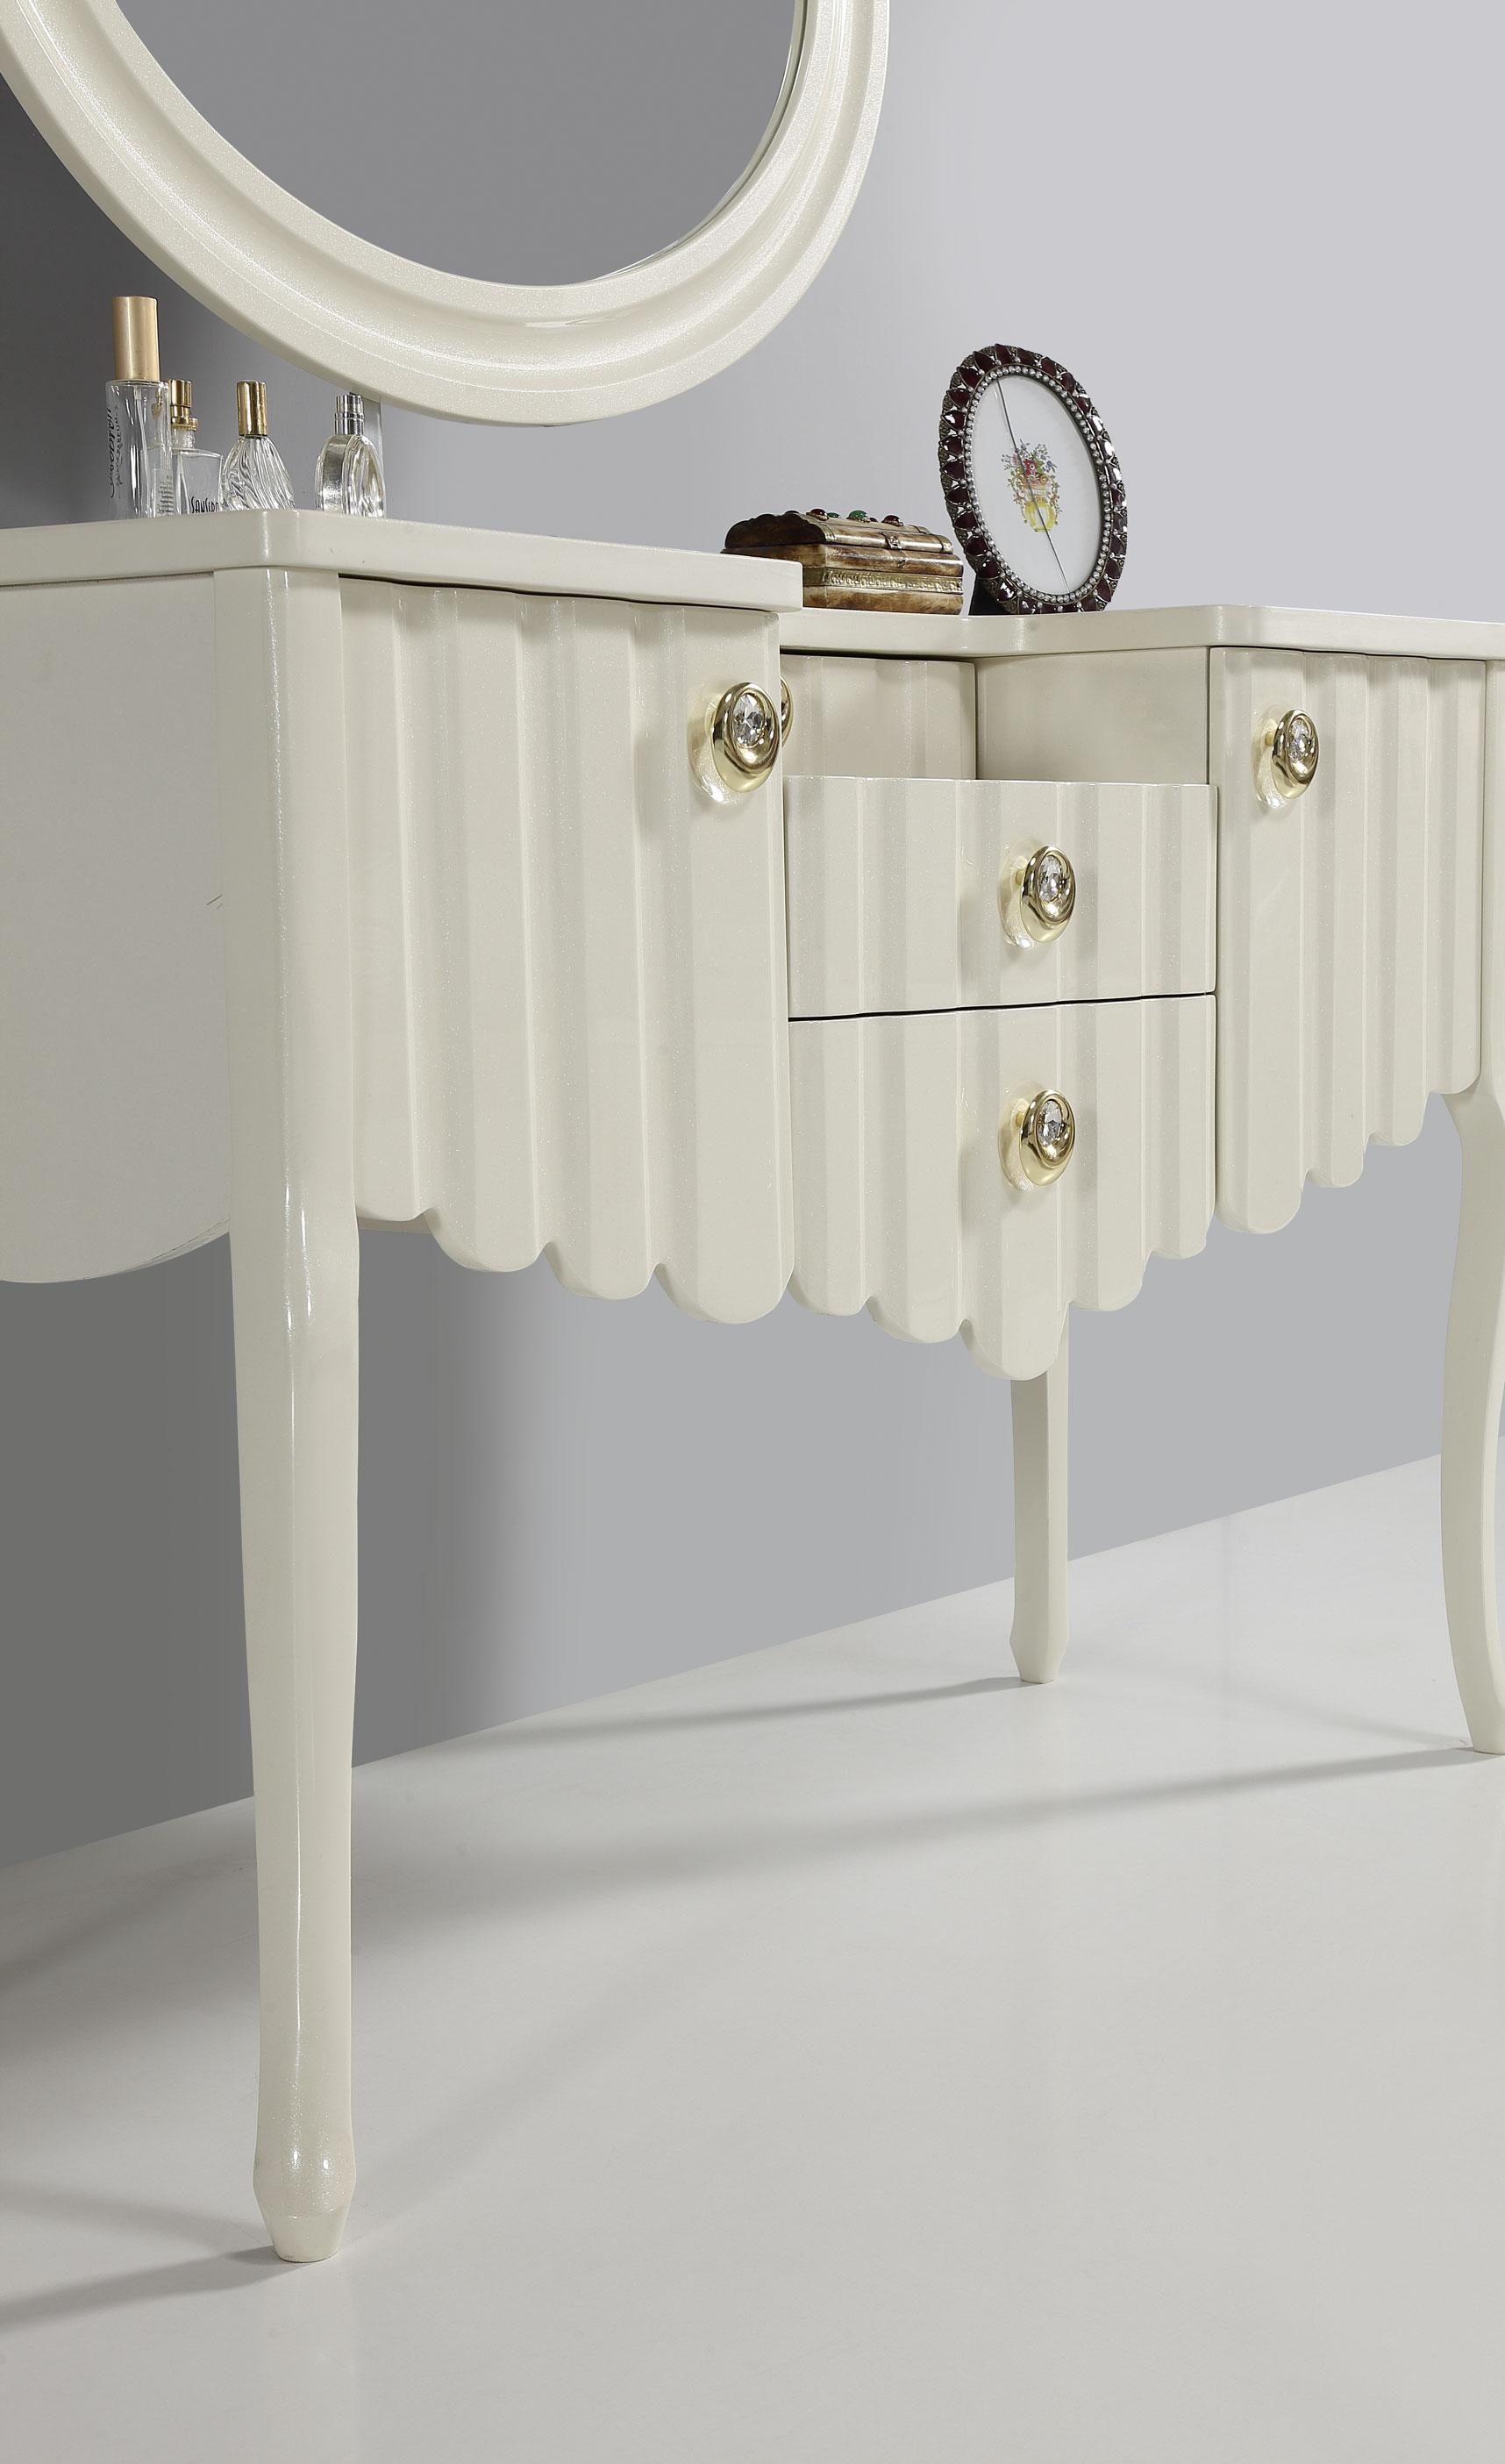 tutku schlafzimmer yuvam m belhaus in wuppertal cilek offizieller h ndler in europa. Black Bedroom Furniture Sets. Home Design Ideas